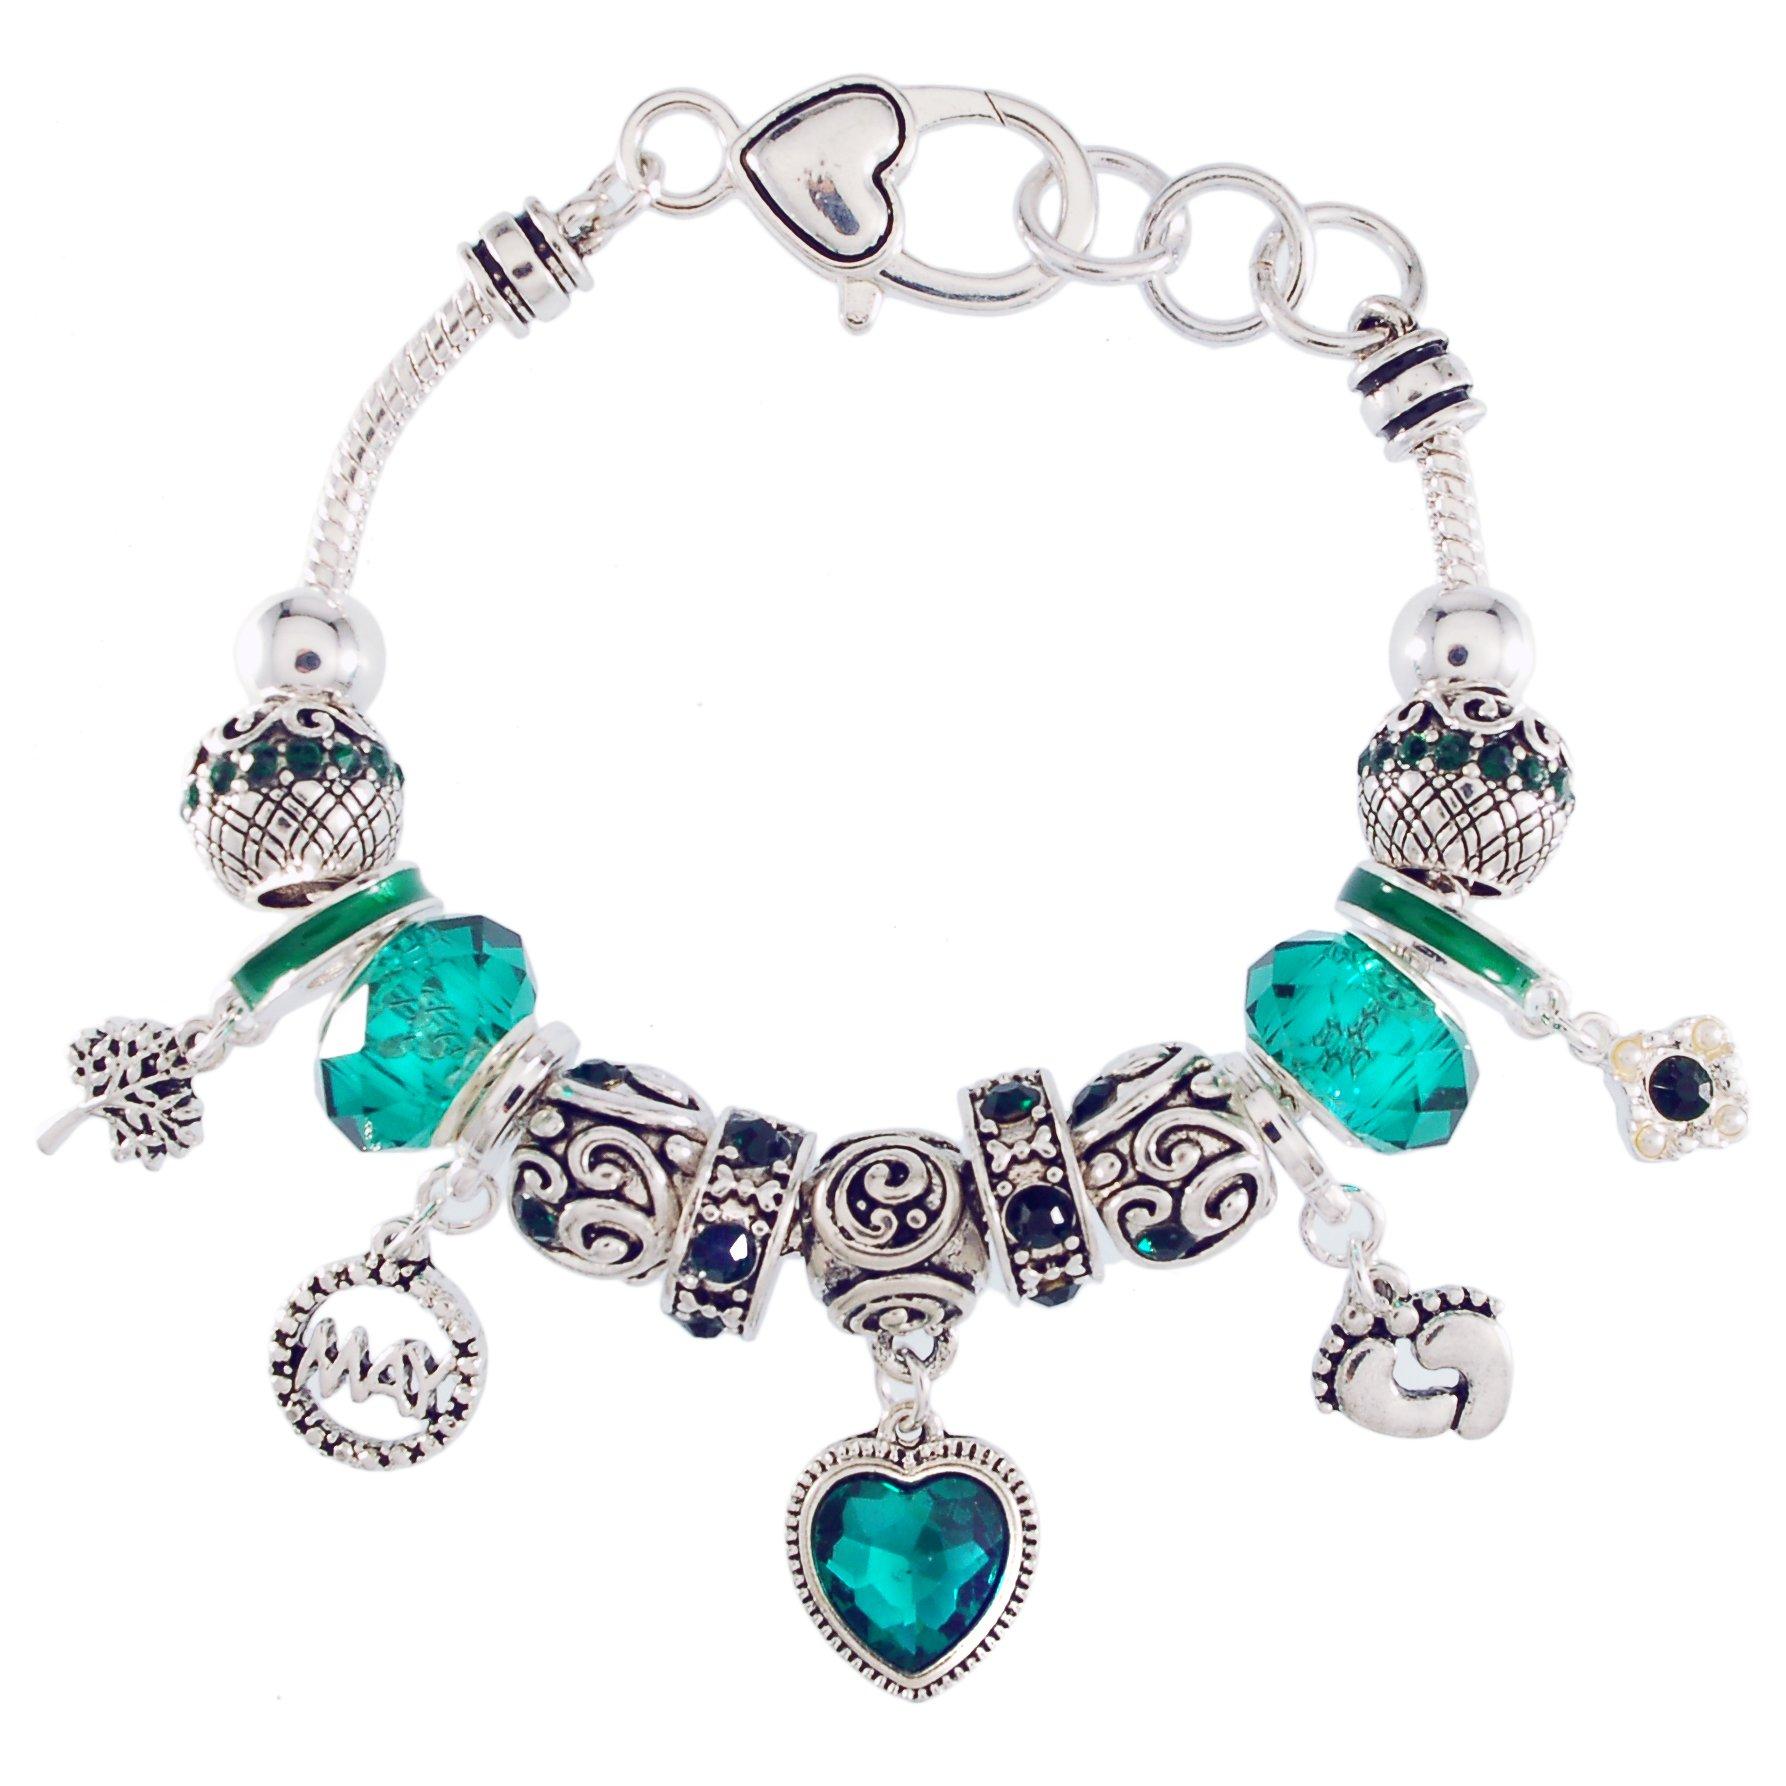 Landau Ambrosia May Birthstone Charm Bracelet